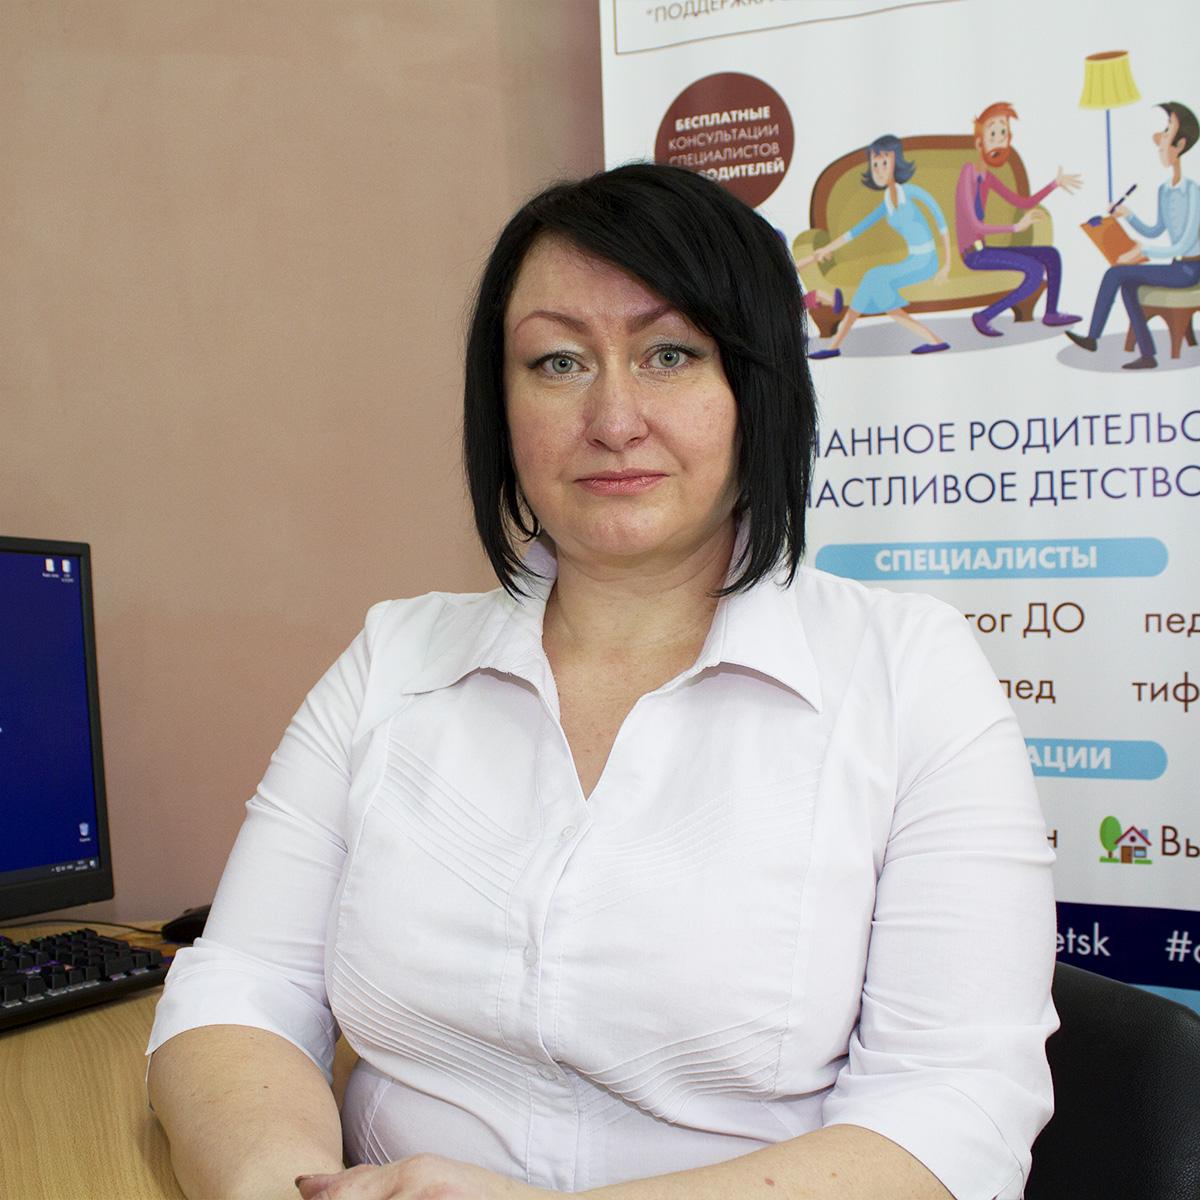 Андросова Ирина Владимировна